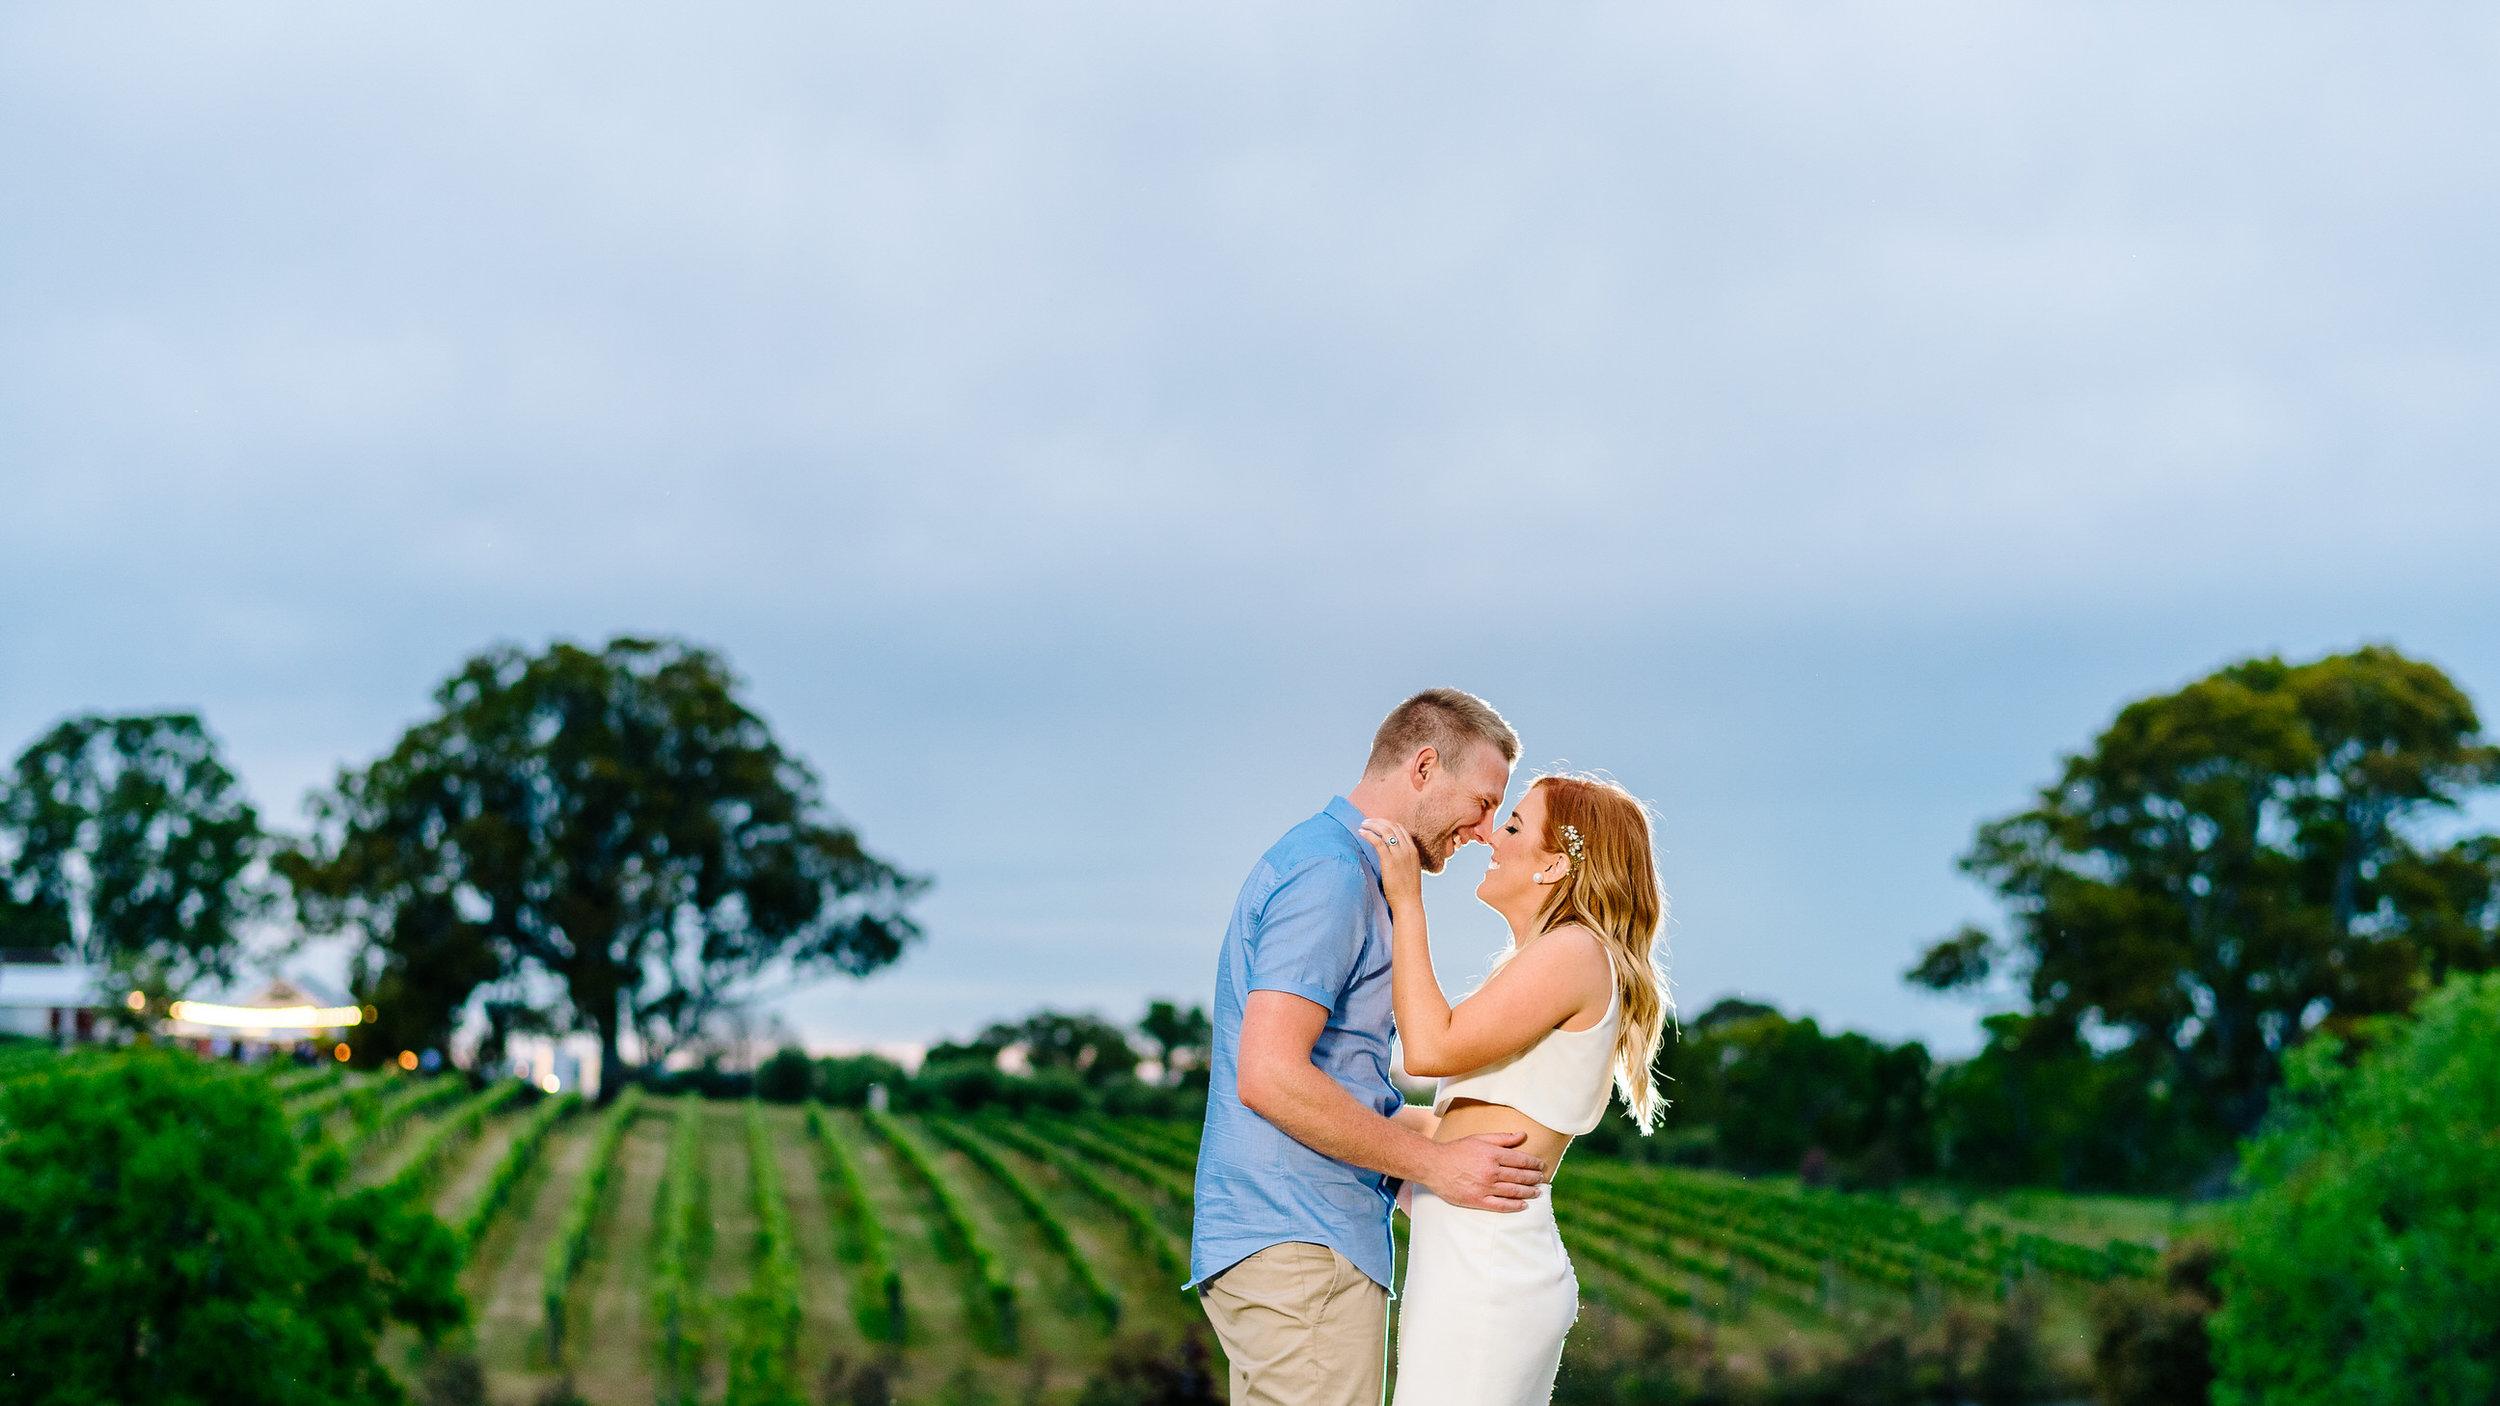 Bendigo_Wedding_Photography_Justin_Jim_BelvoirPark-263.JPG